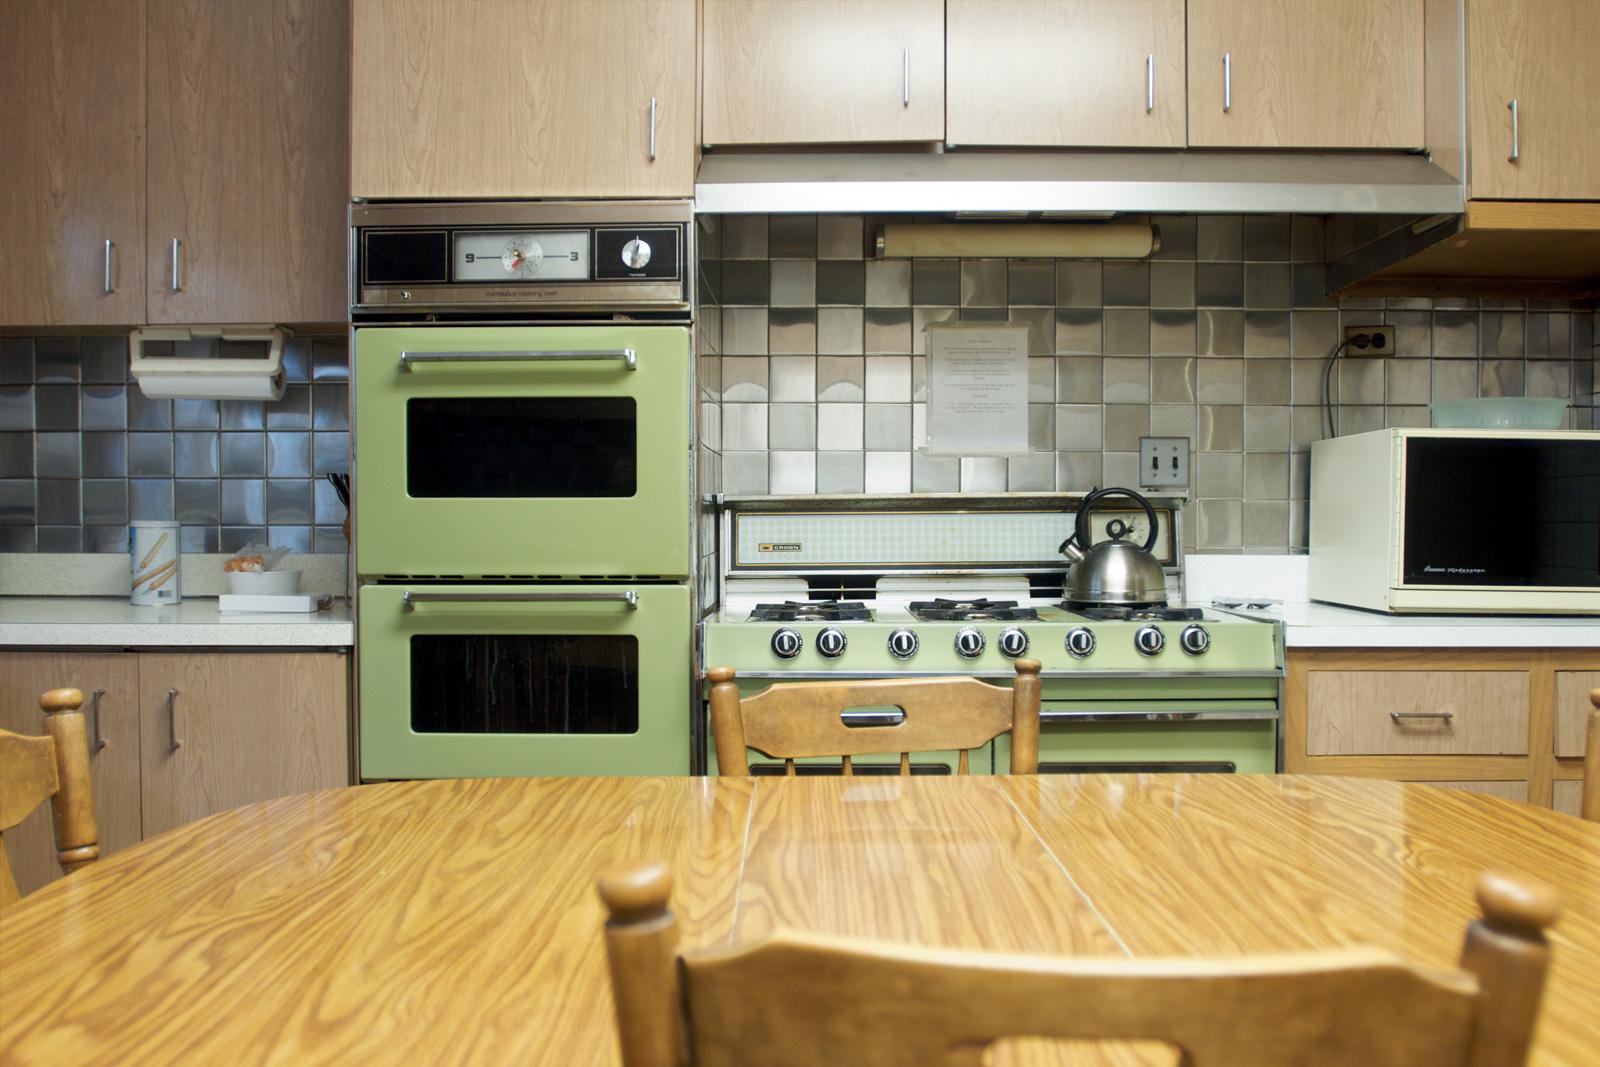 smart options kitchen flooring cheap kitchen flooring Avocado green kitchen